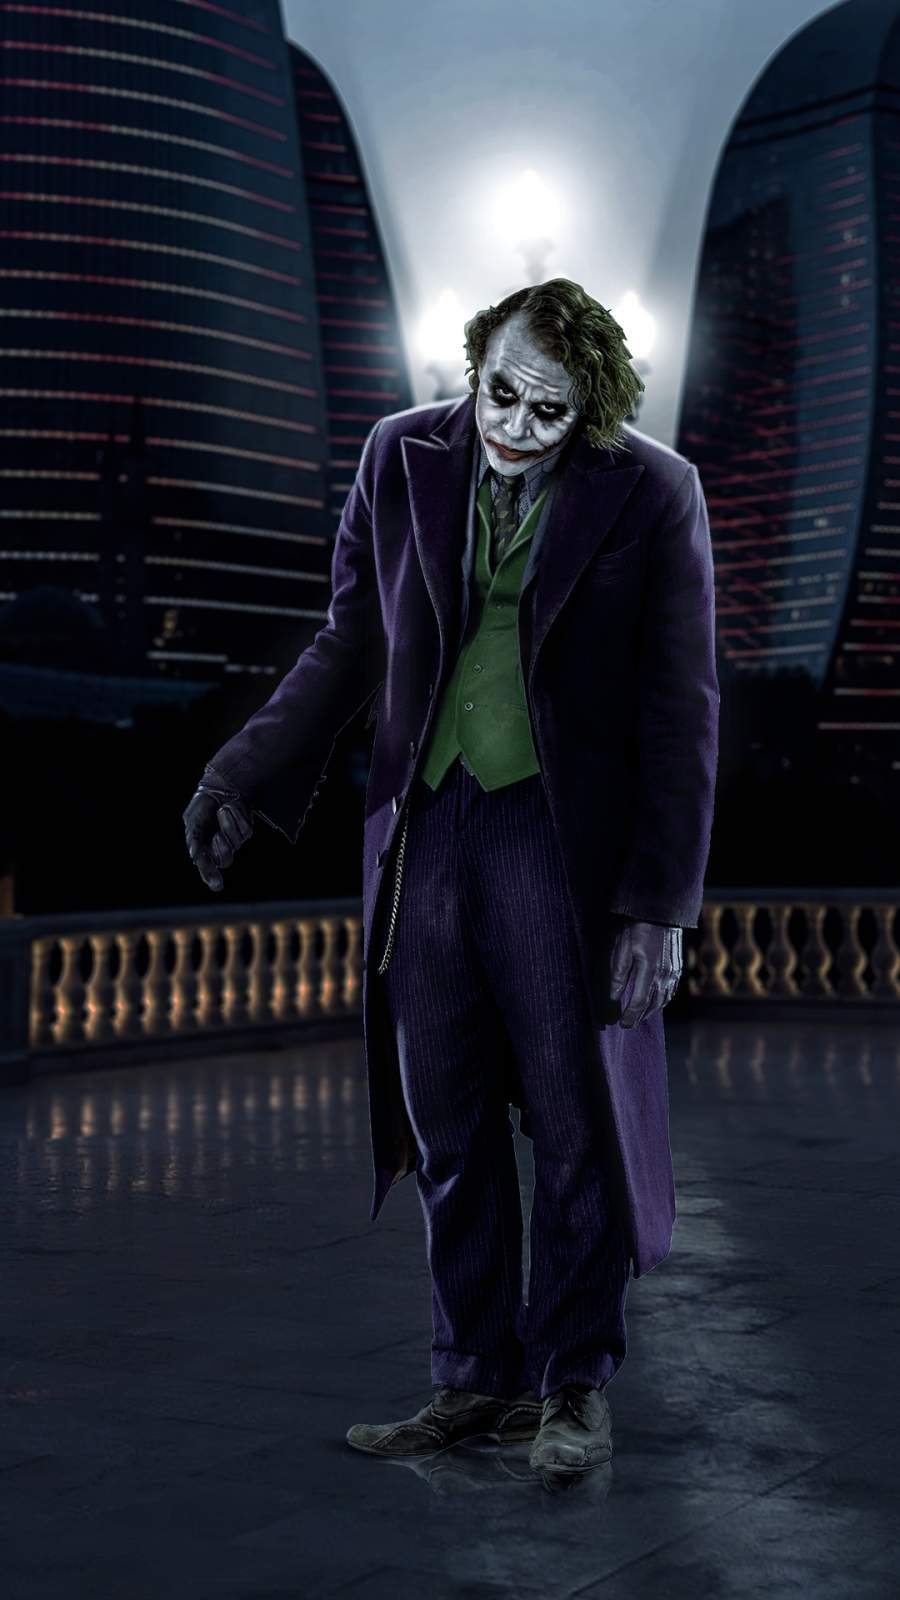 Joker Out 4k